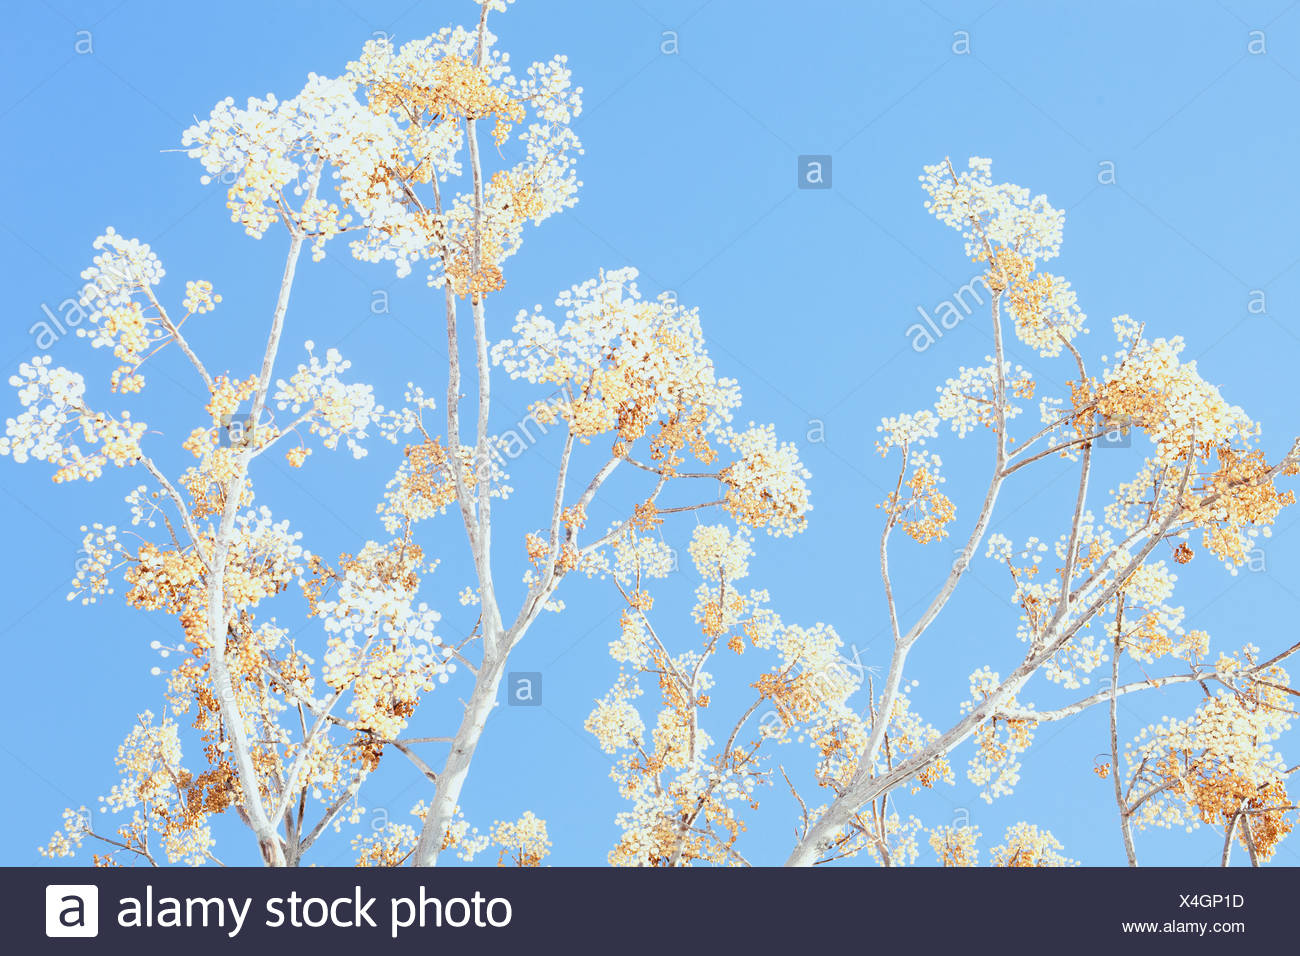 Plante contre ciel bleu clair Photo Stock